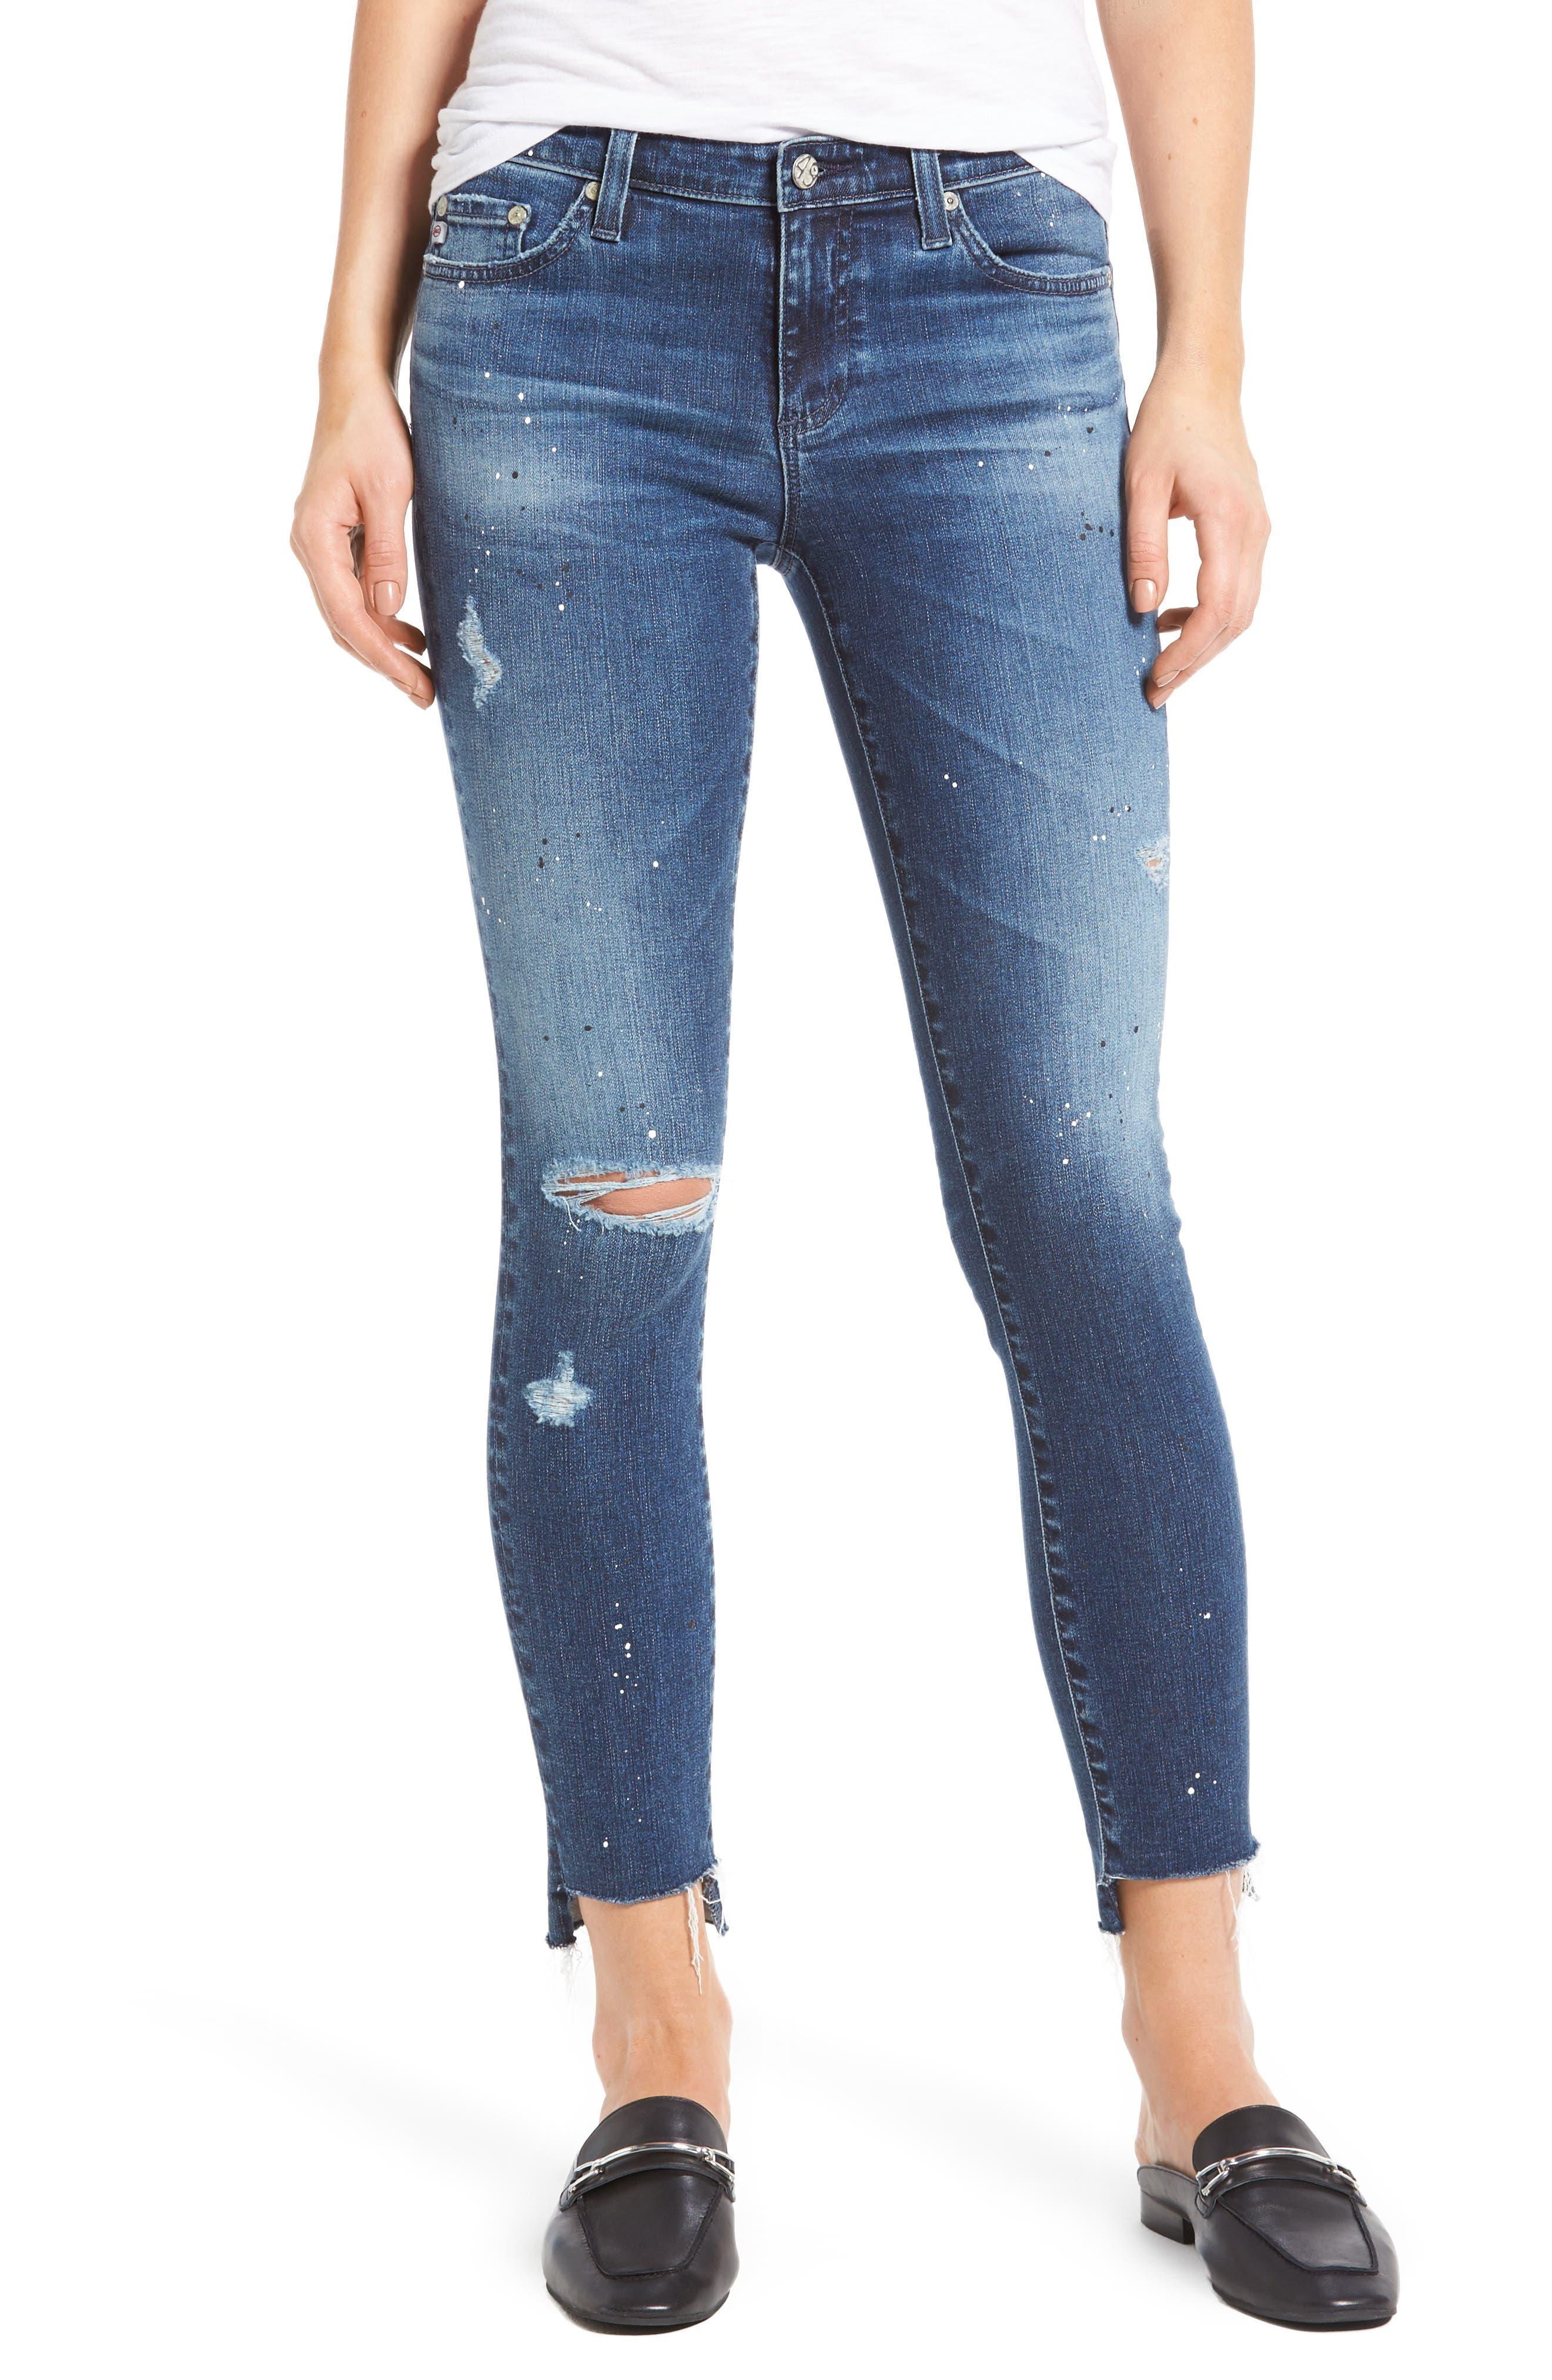 Alternate Image 1 Selected - AG The Legging Step Hem Ankle Skinny Jeans (10 Years Beatnik)